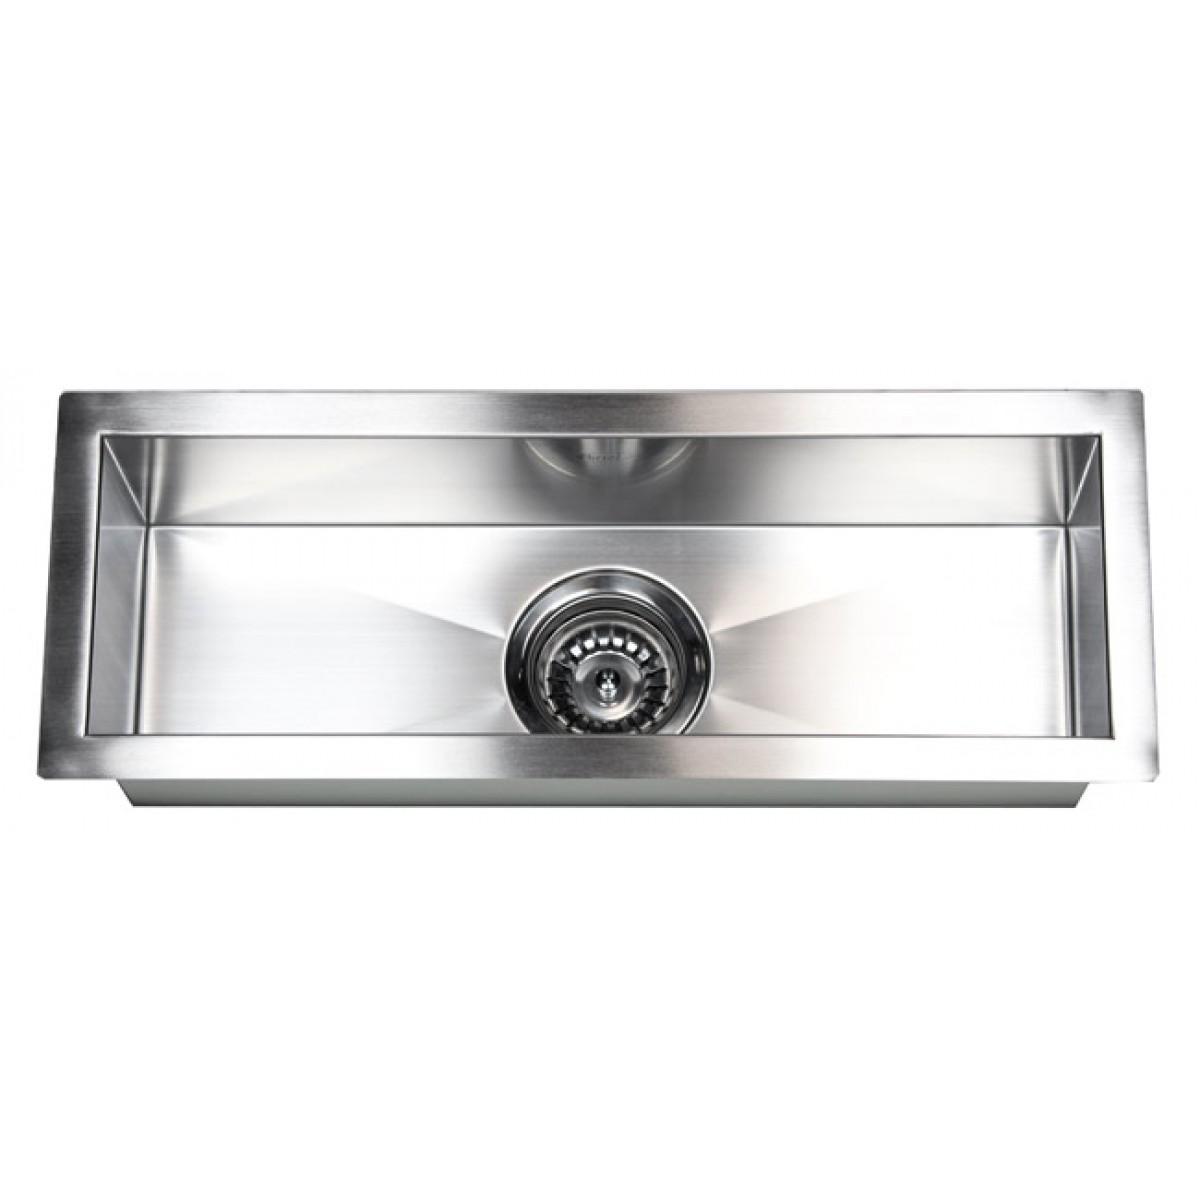 23 Inch Stainless Steel Undermount Single Bowl Kitchen